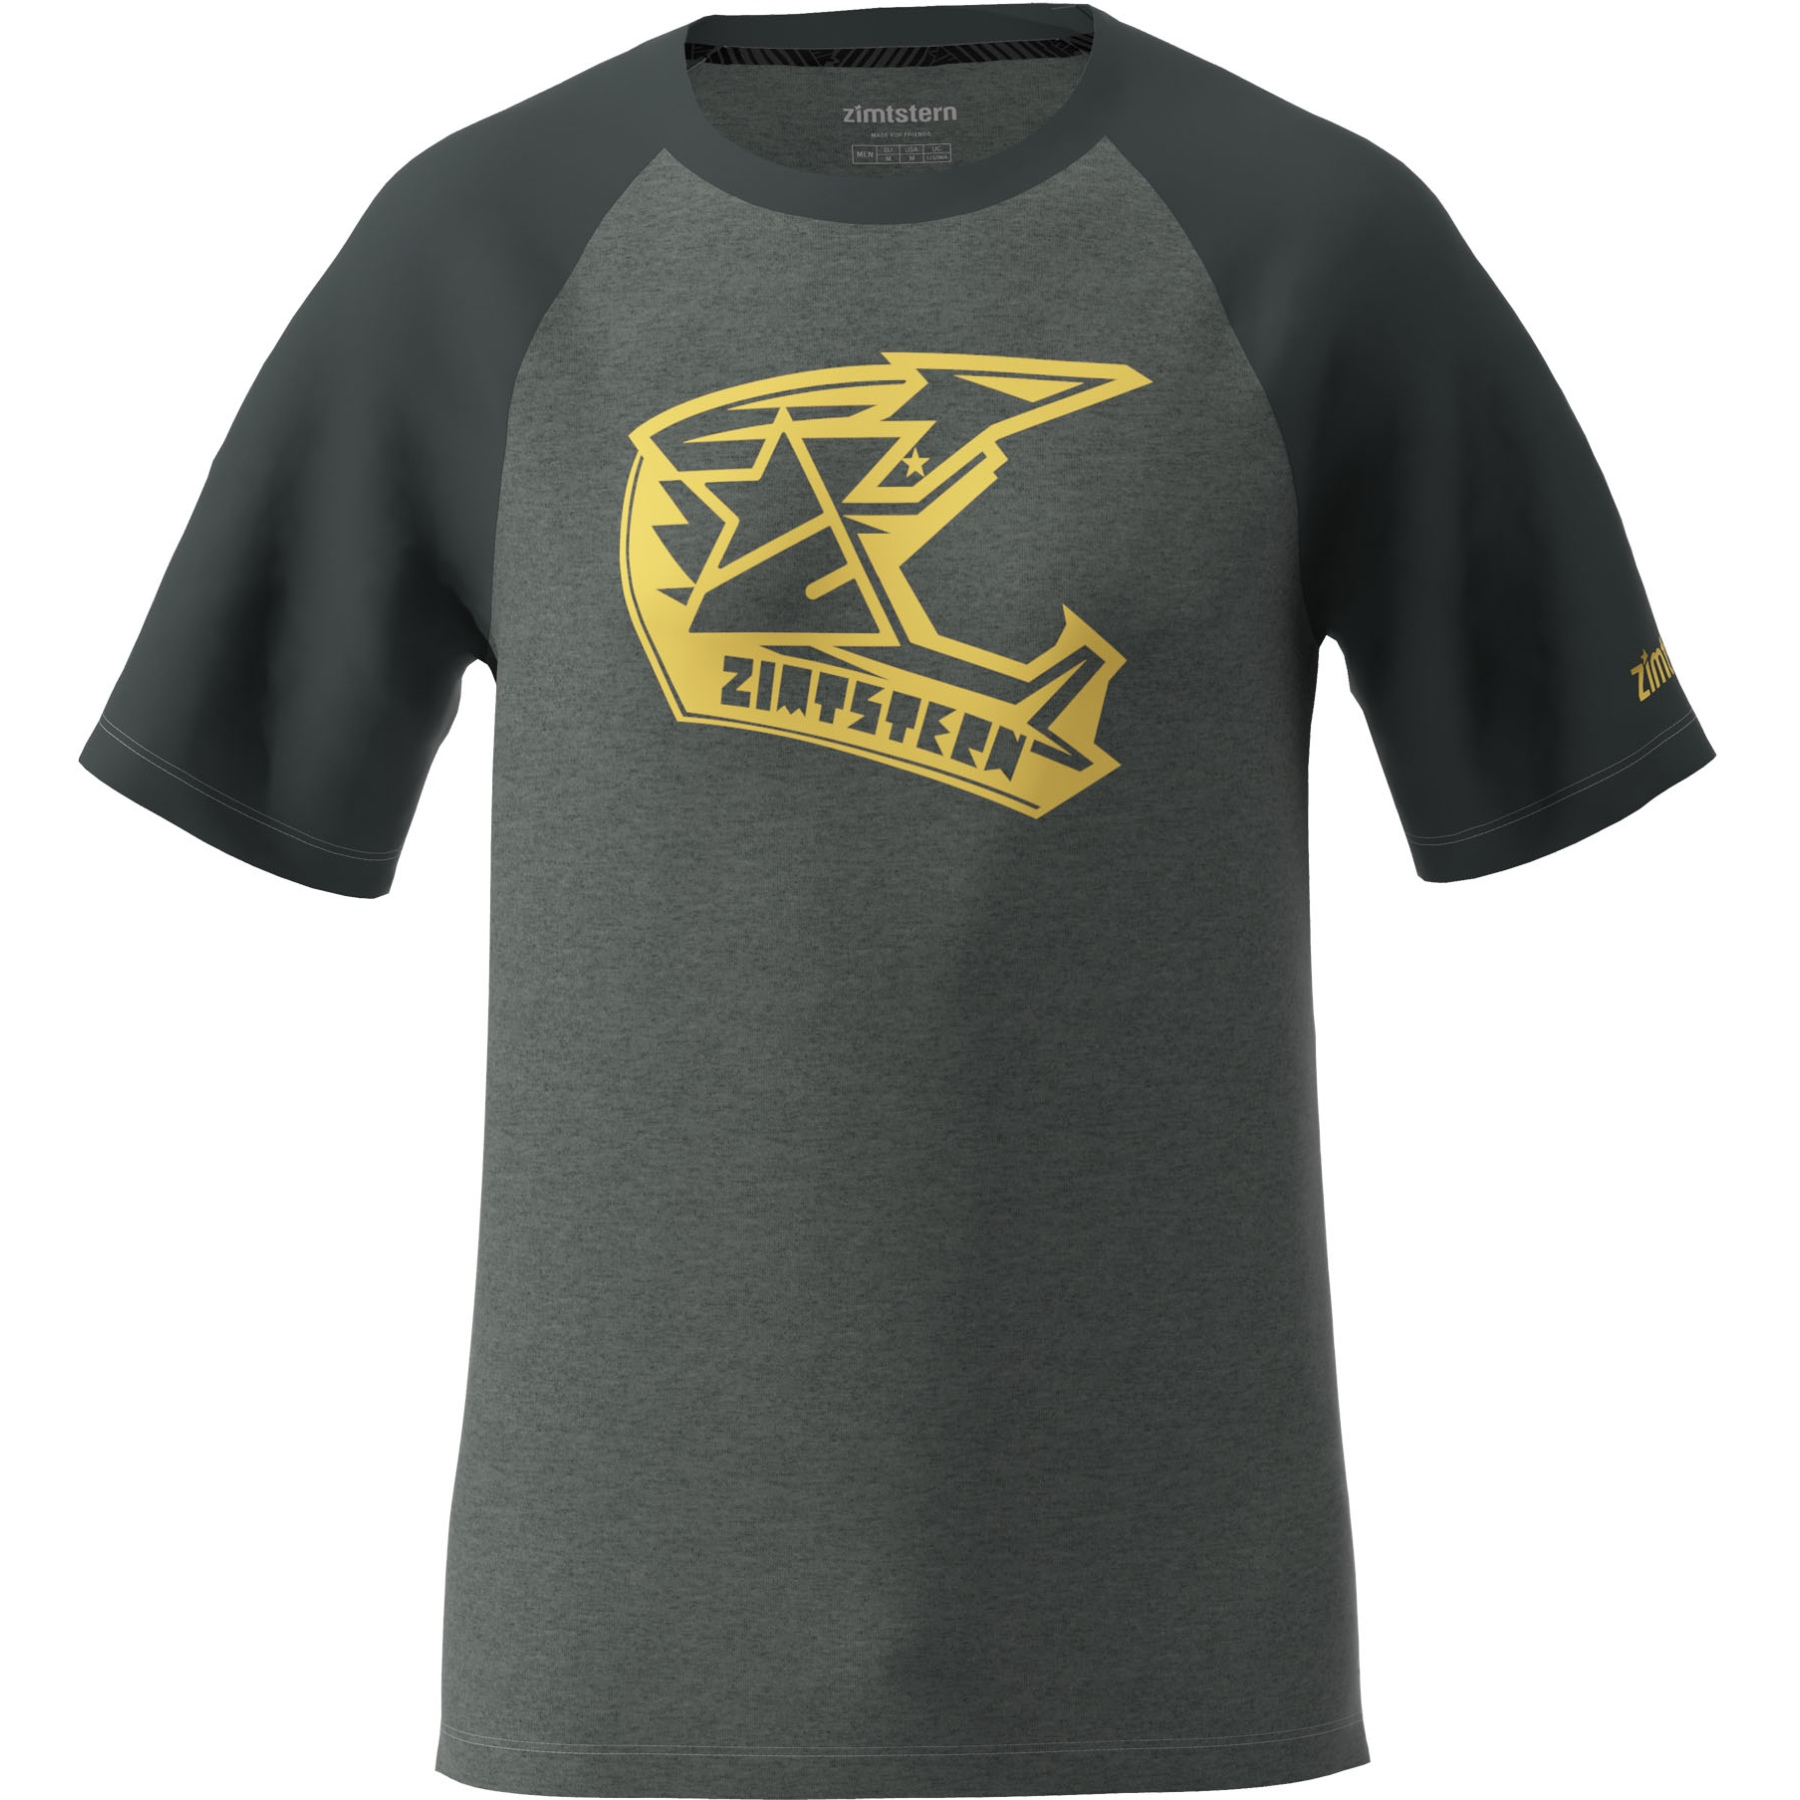 Zimtstern Faze T-Shirt - gun metal melange/pirate black